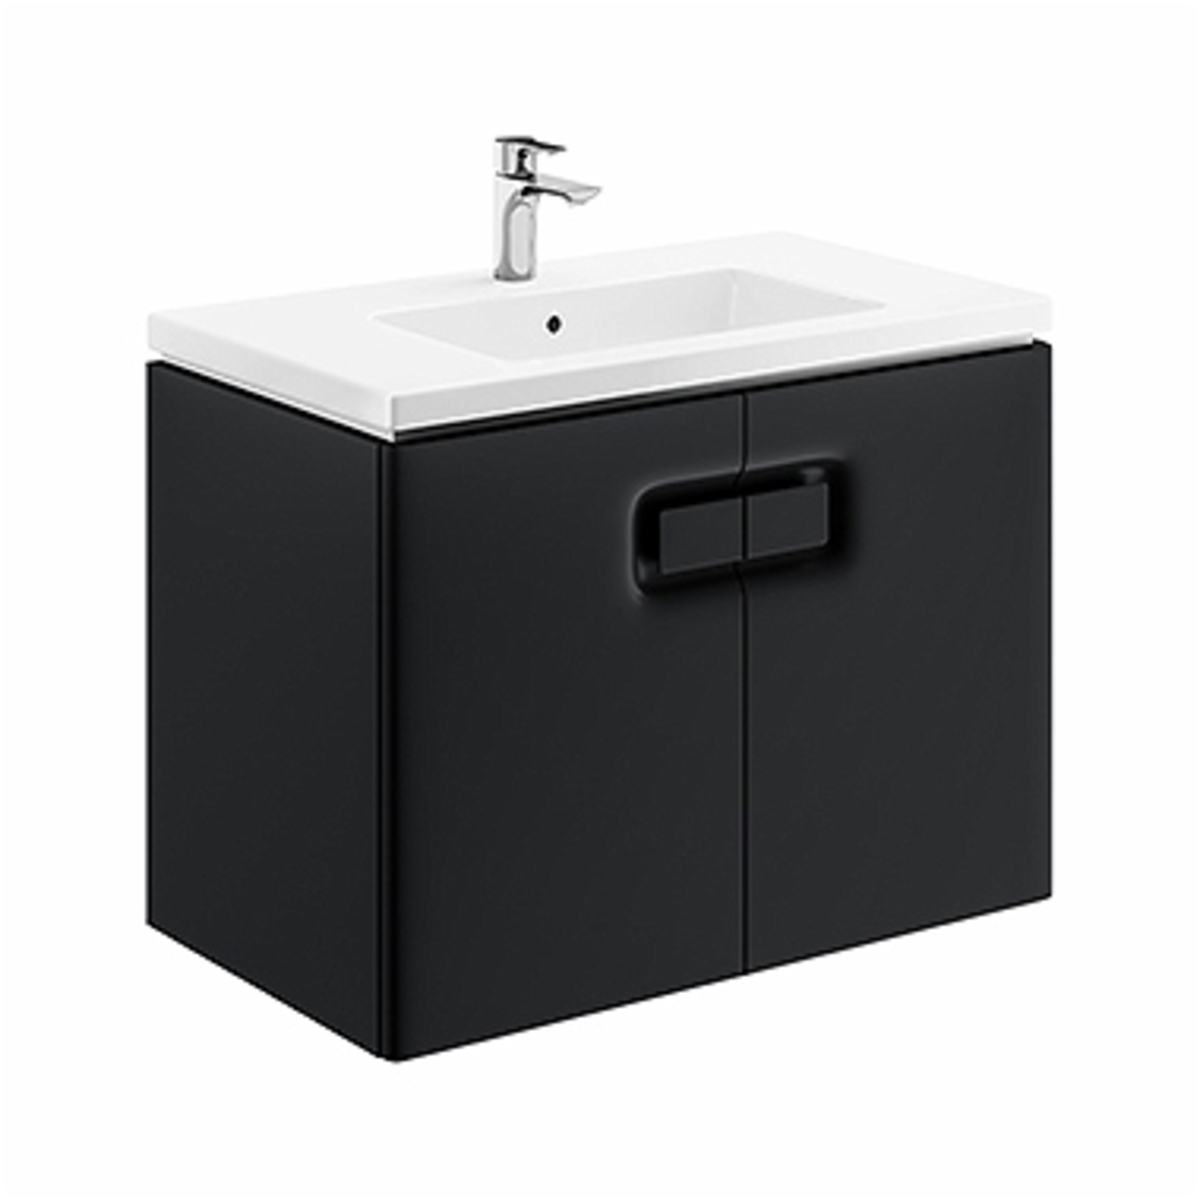 Kúpeľňová skrinka pod umývadlo Kolo Twins 80x57x46 cm čierna mat 89549000